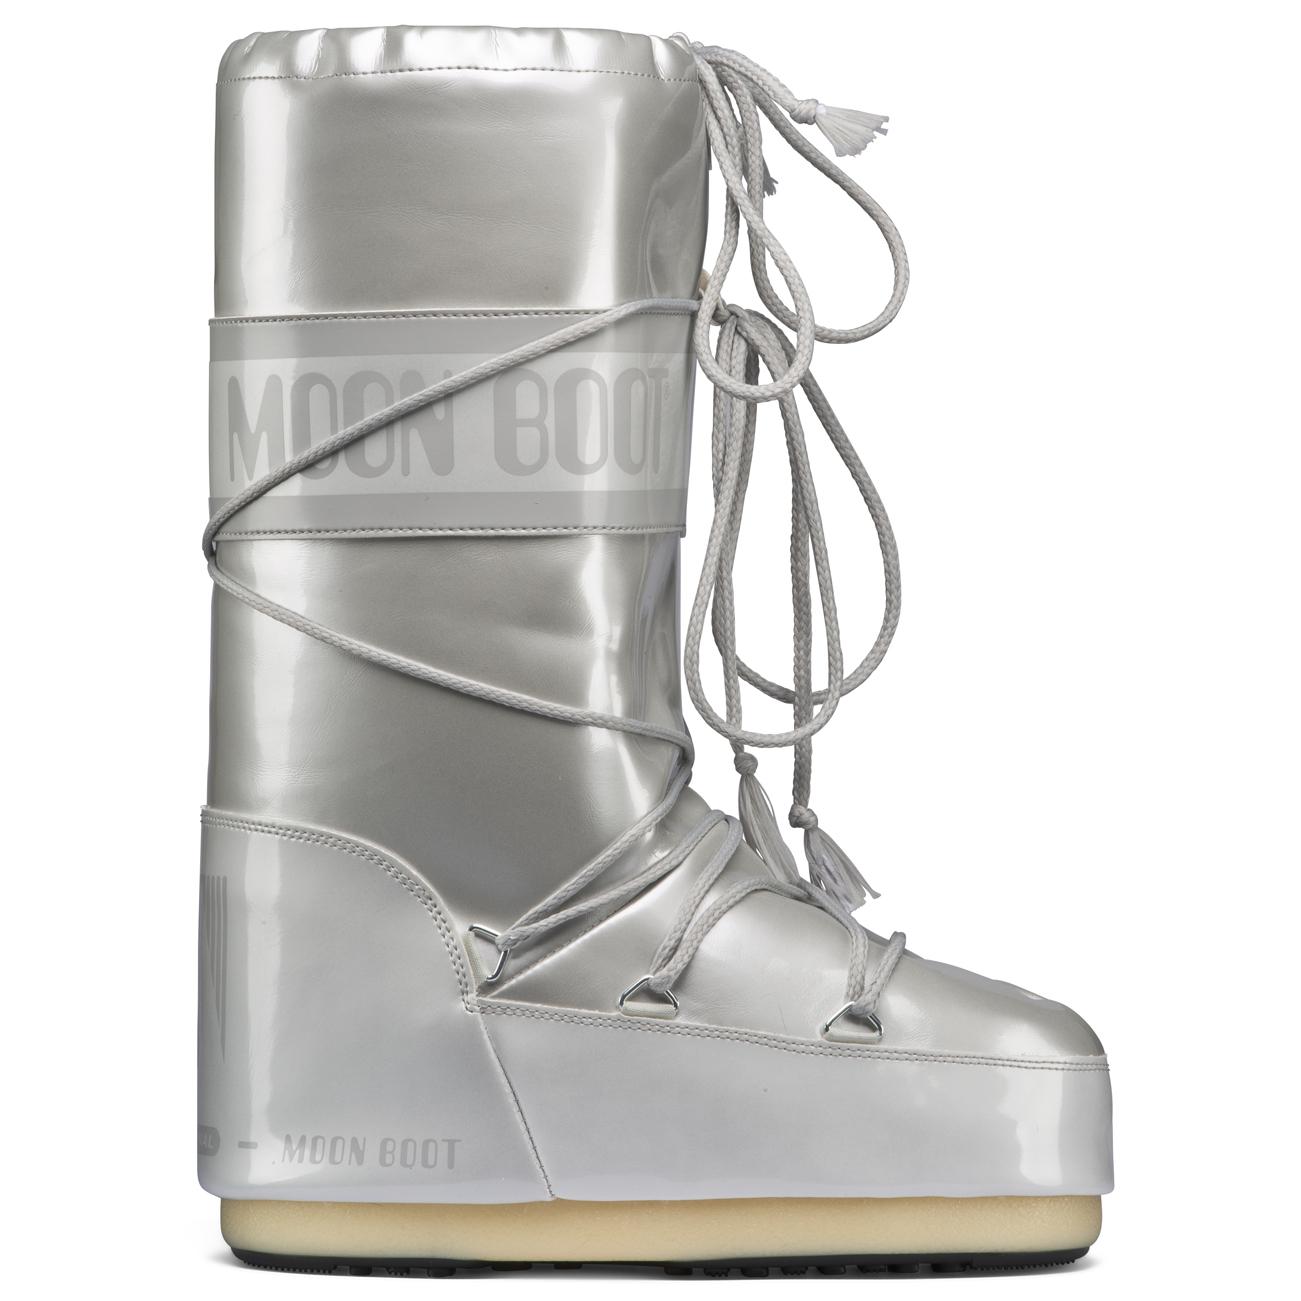 Unisex-Adults-Original-Tecnica-Moon-Boot-Vinil-Met-Nylon-Padded-Boots-All-Sizes